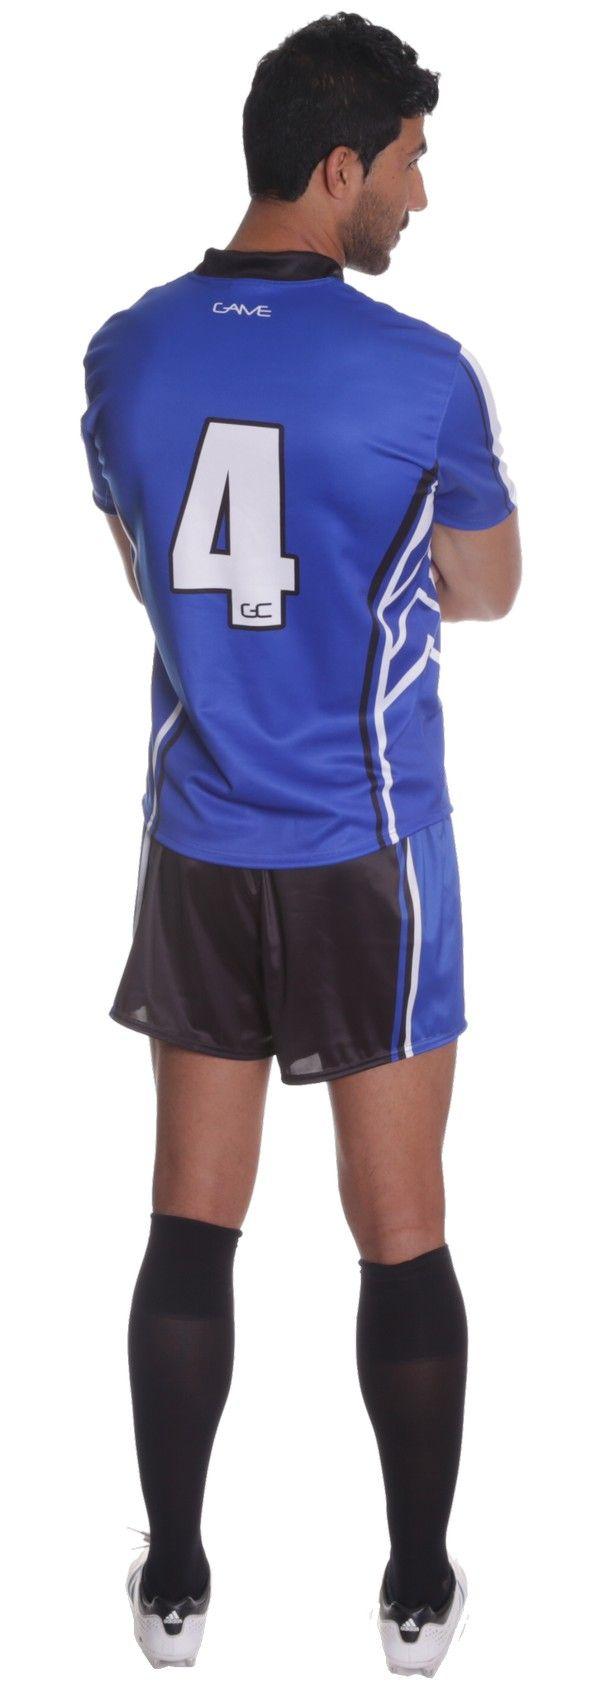 Football Uniforms | #FootballUniforms #FootballJerseys